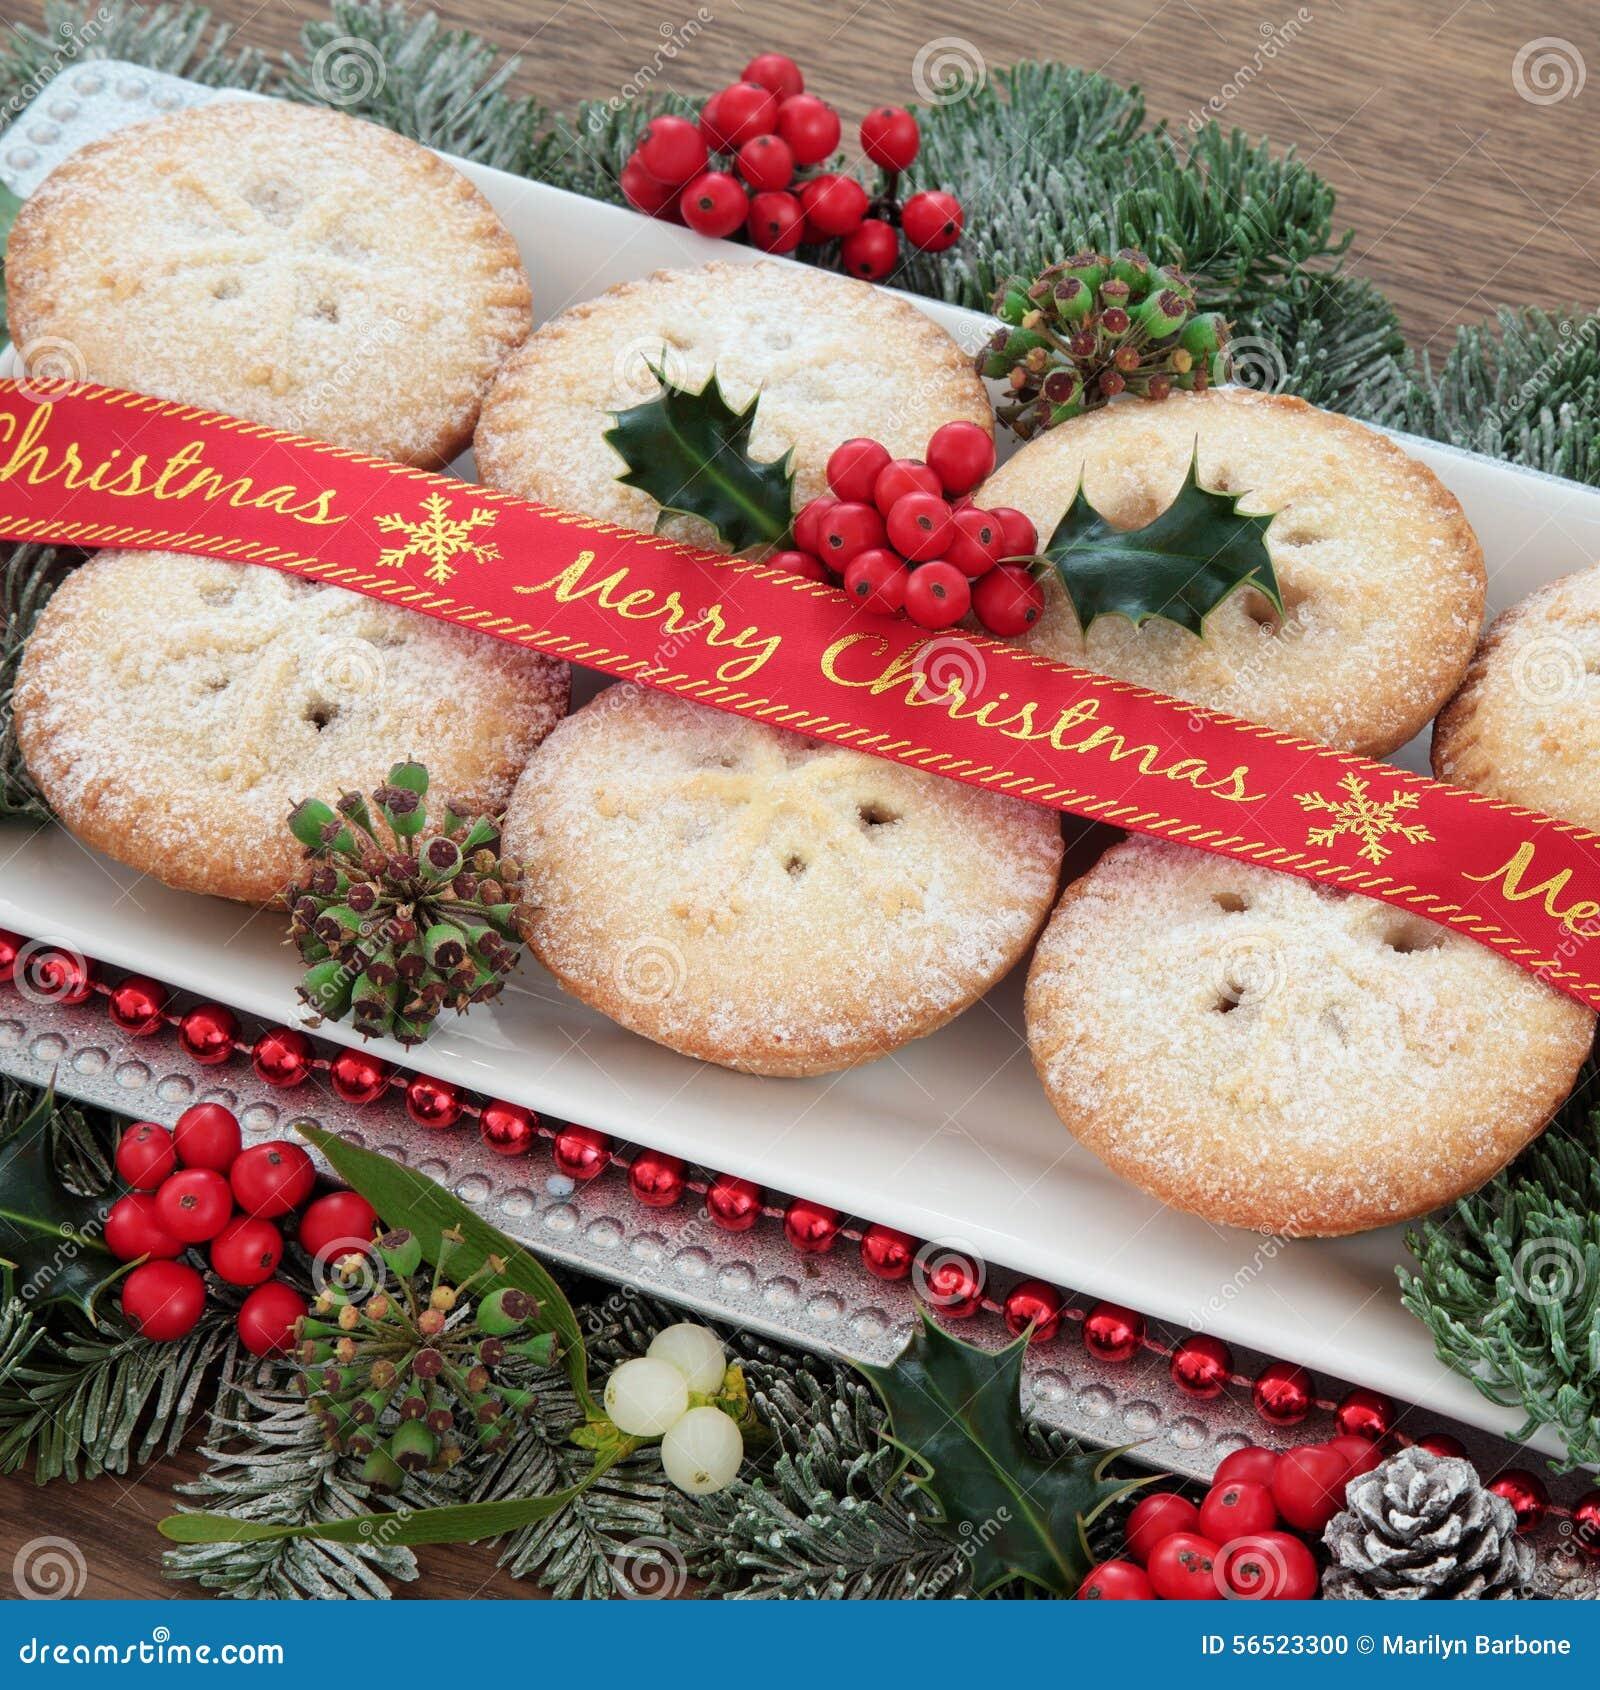 mince-pies-pie-cakes-merry-christmas-ribbon-holly-mistletoe-winter ...